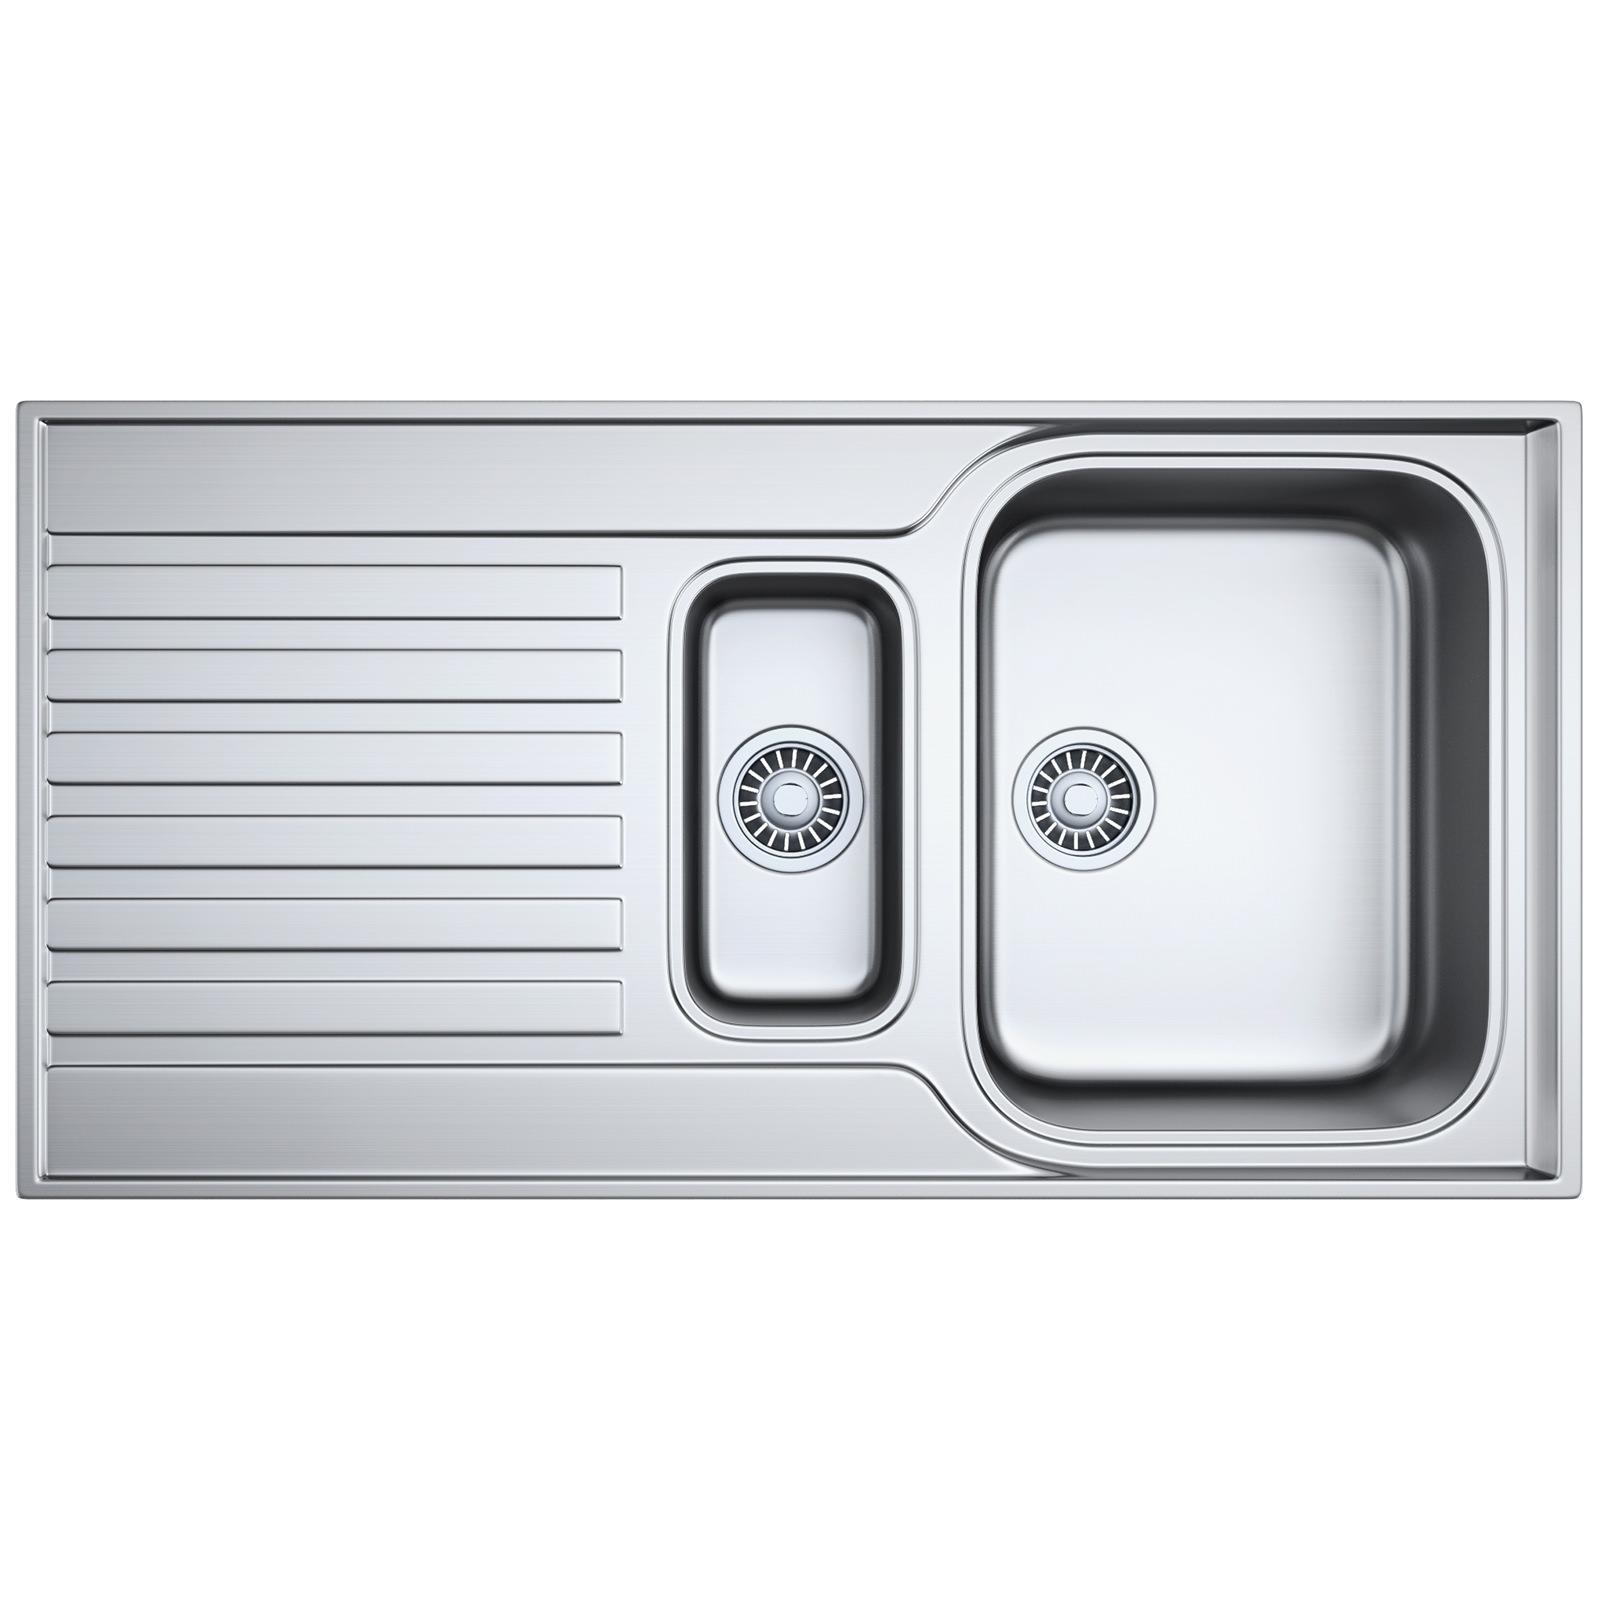 Franke Ascona ASX 651 Stainless Steel 1.5 Bowl Inset Sink 101.0277 ...